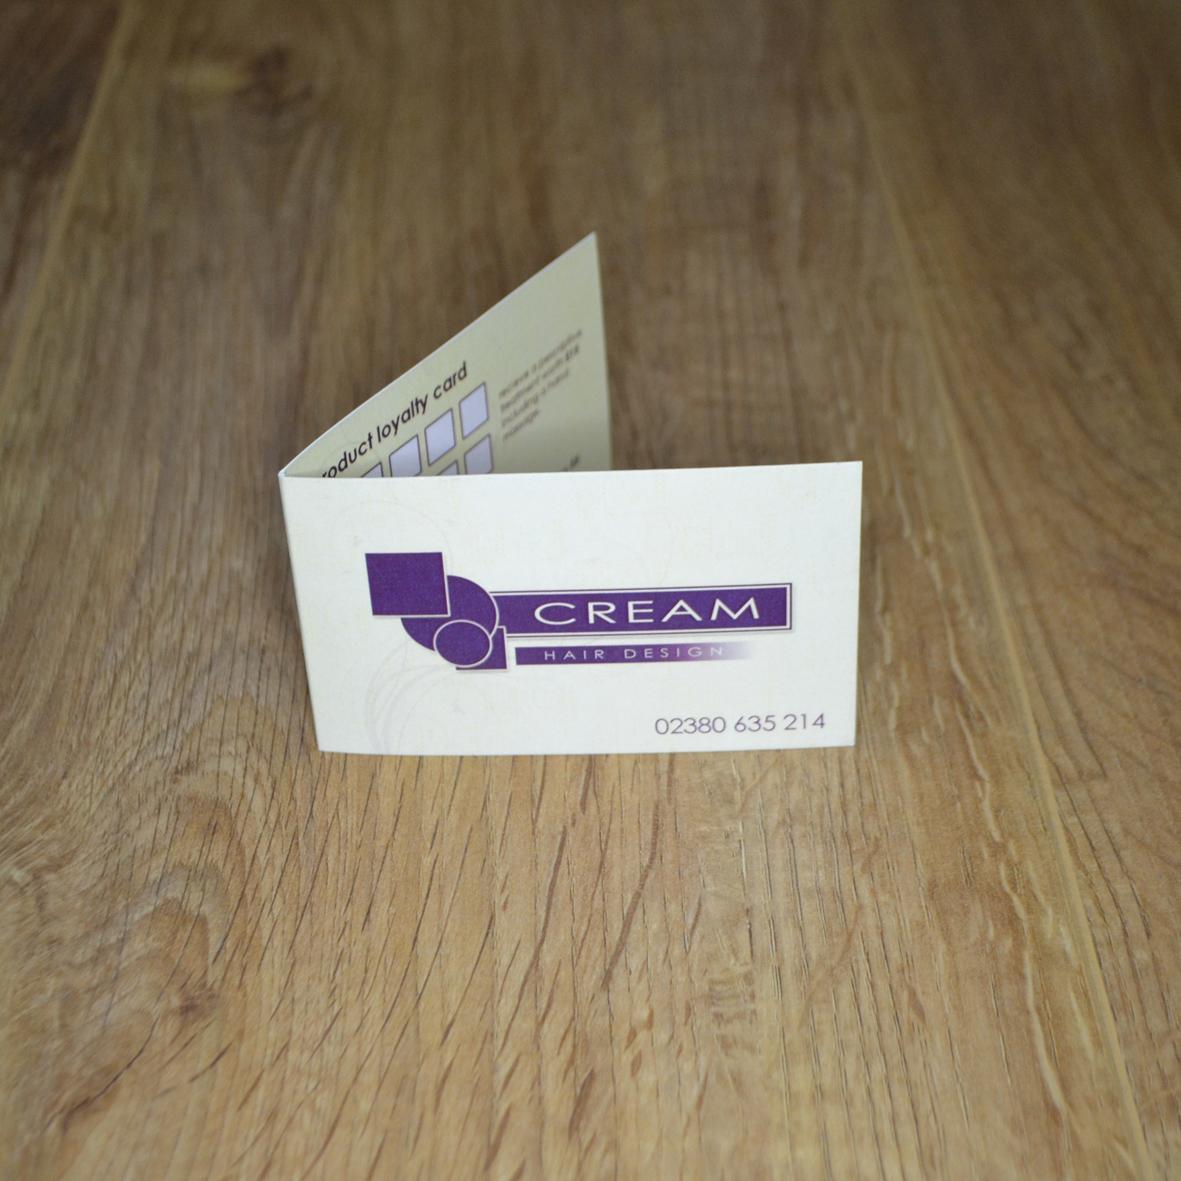 Folded Cards - Colour Company Southampton